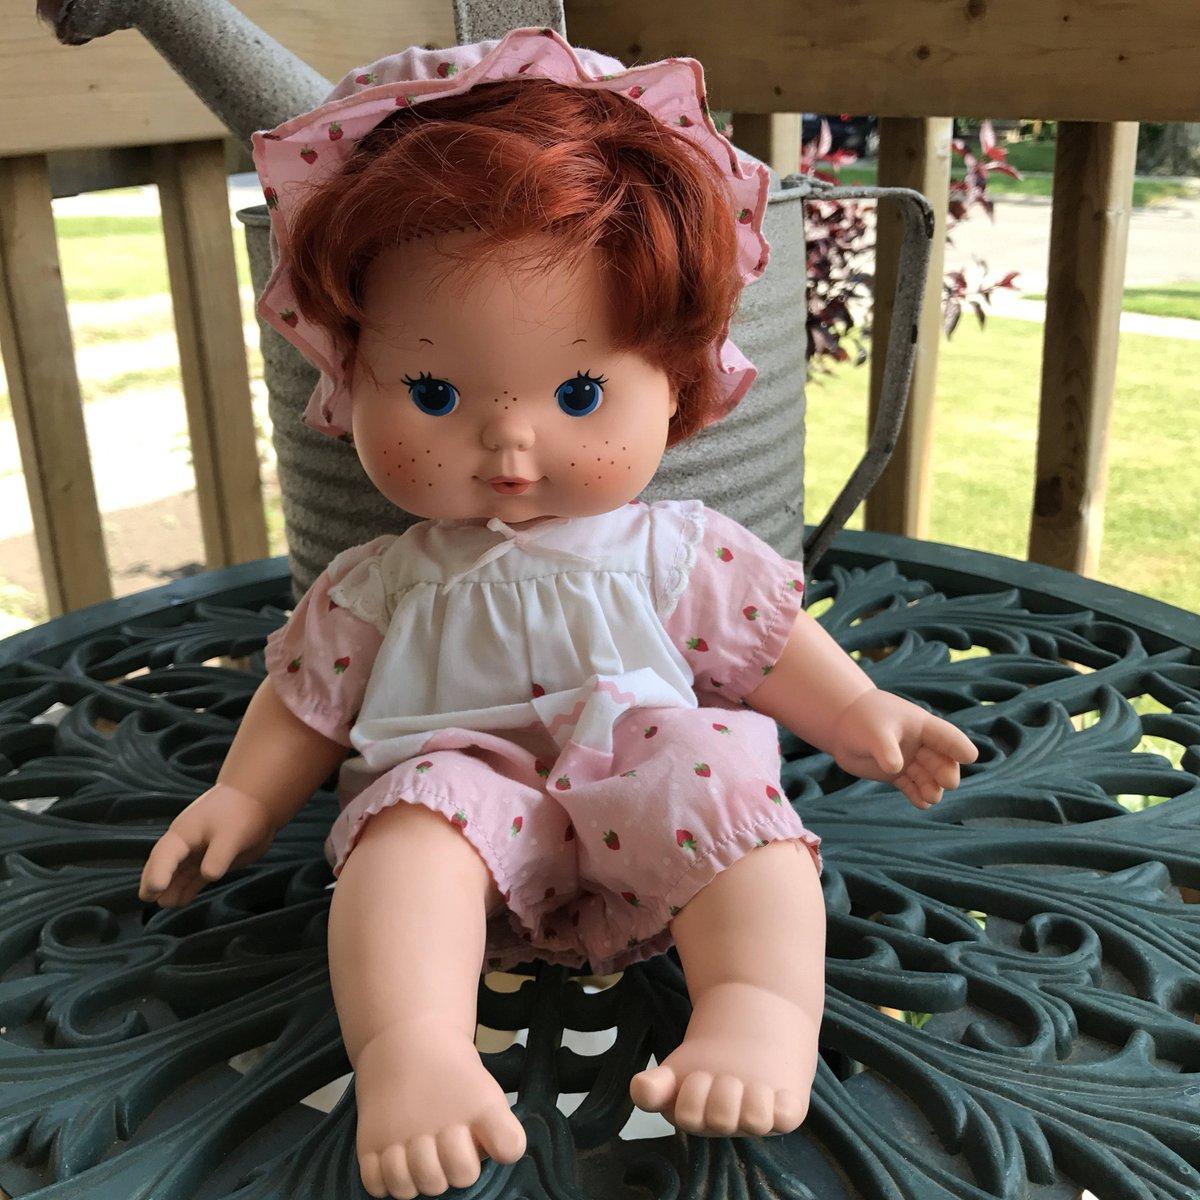 1982 American Greetings Corp. Strawberry Shortcake 14 Inch Doll Pink Jumpe…  http:// tuppu.net/e98160ac  &nbsp;   #Etsy #Nostalgia<br>http://pic.twitter.com/VvVa9p2abe